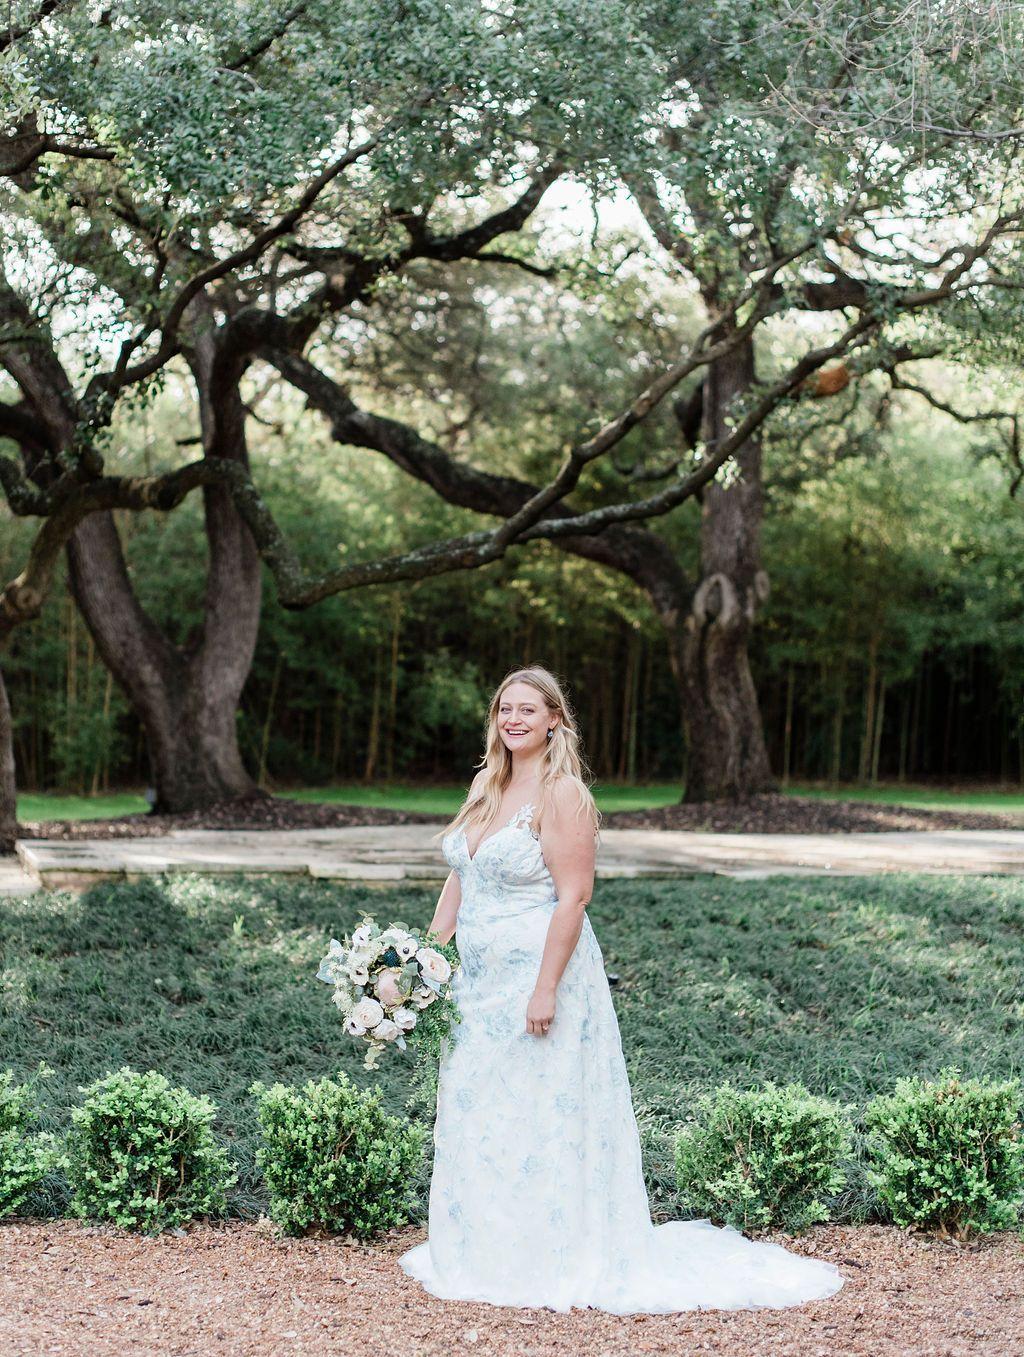 Luna Bridal Gown Bridal Gowns Bridal Wedding Bridesmaid Dresses